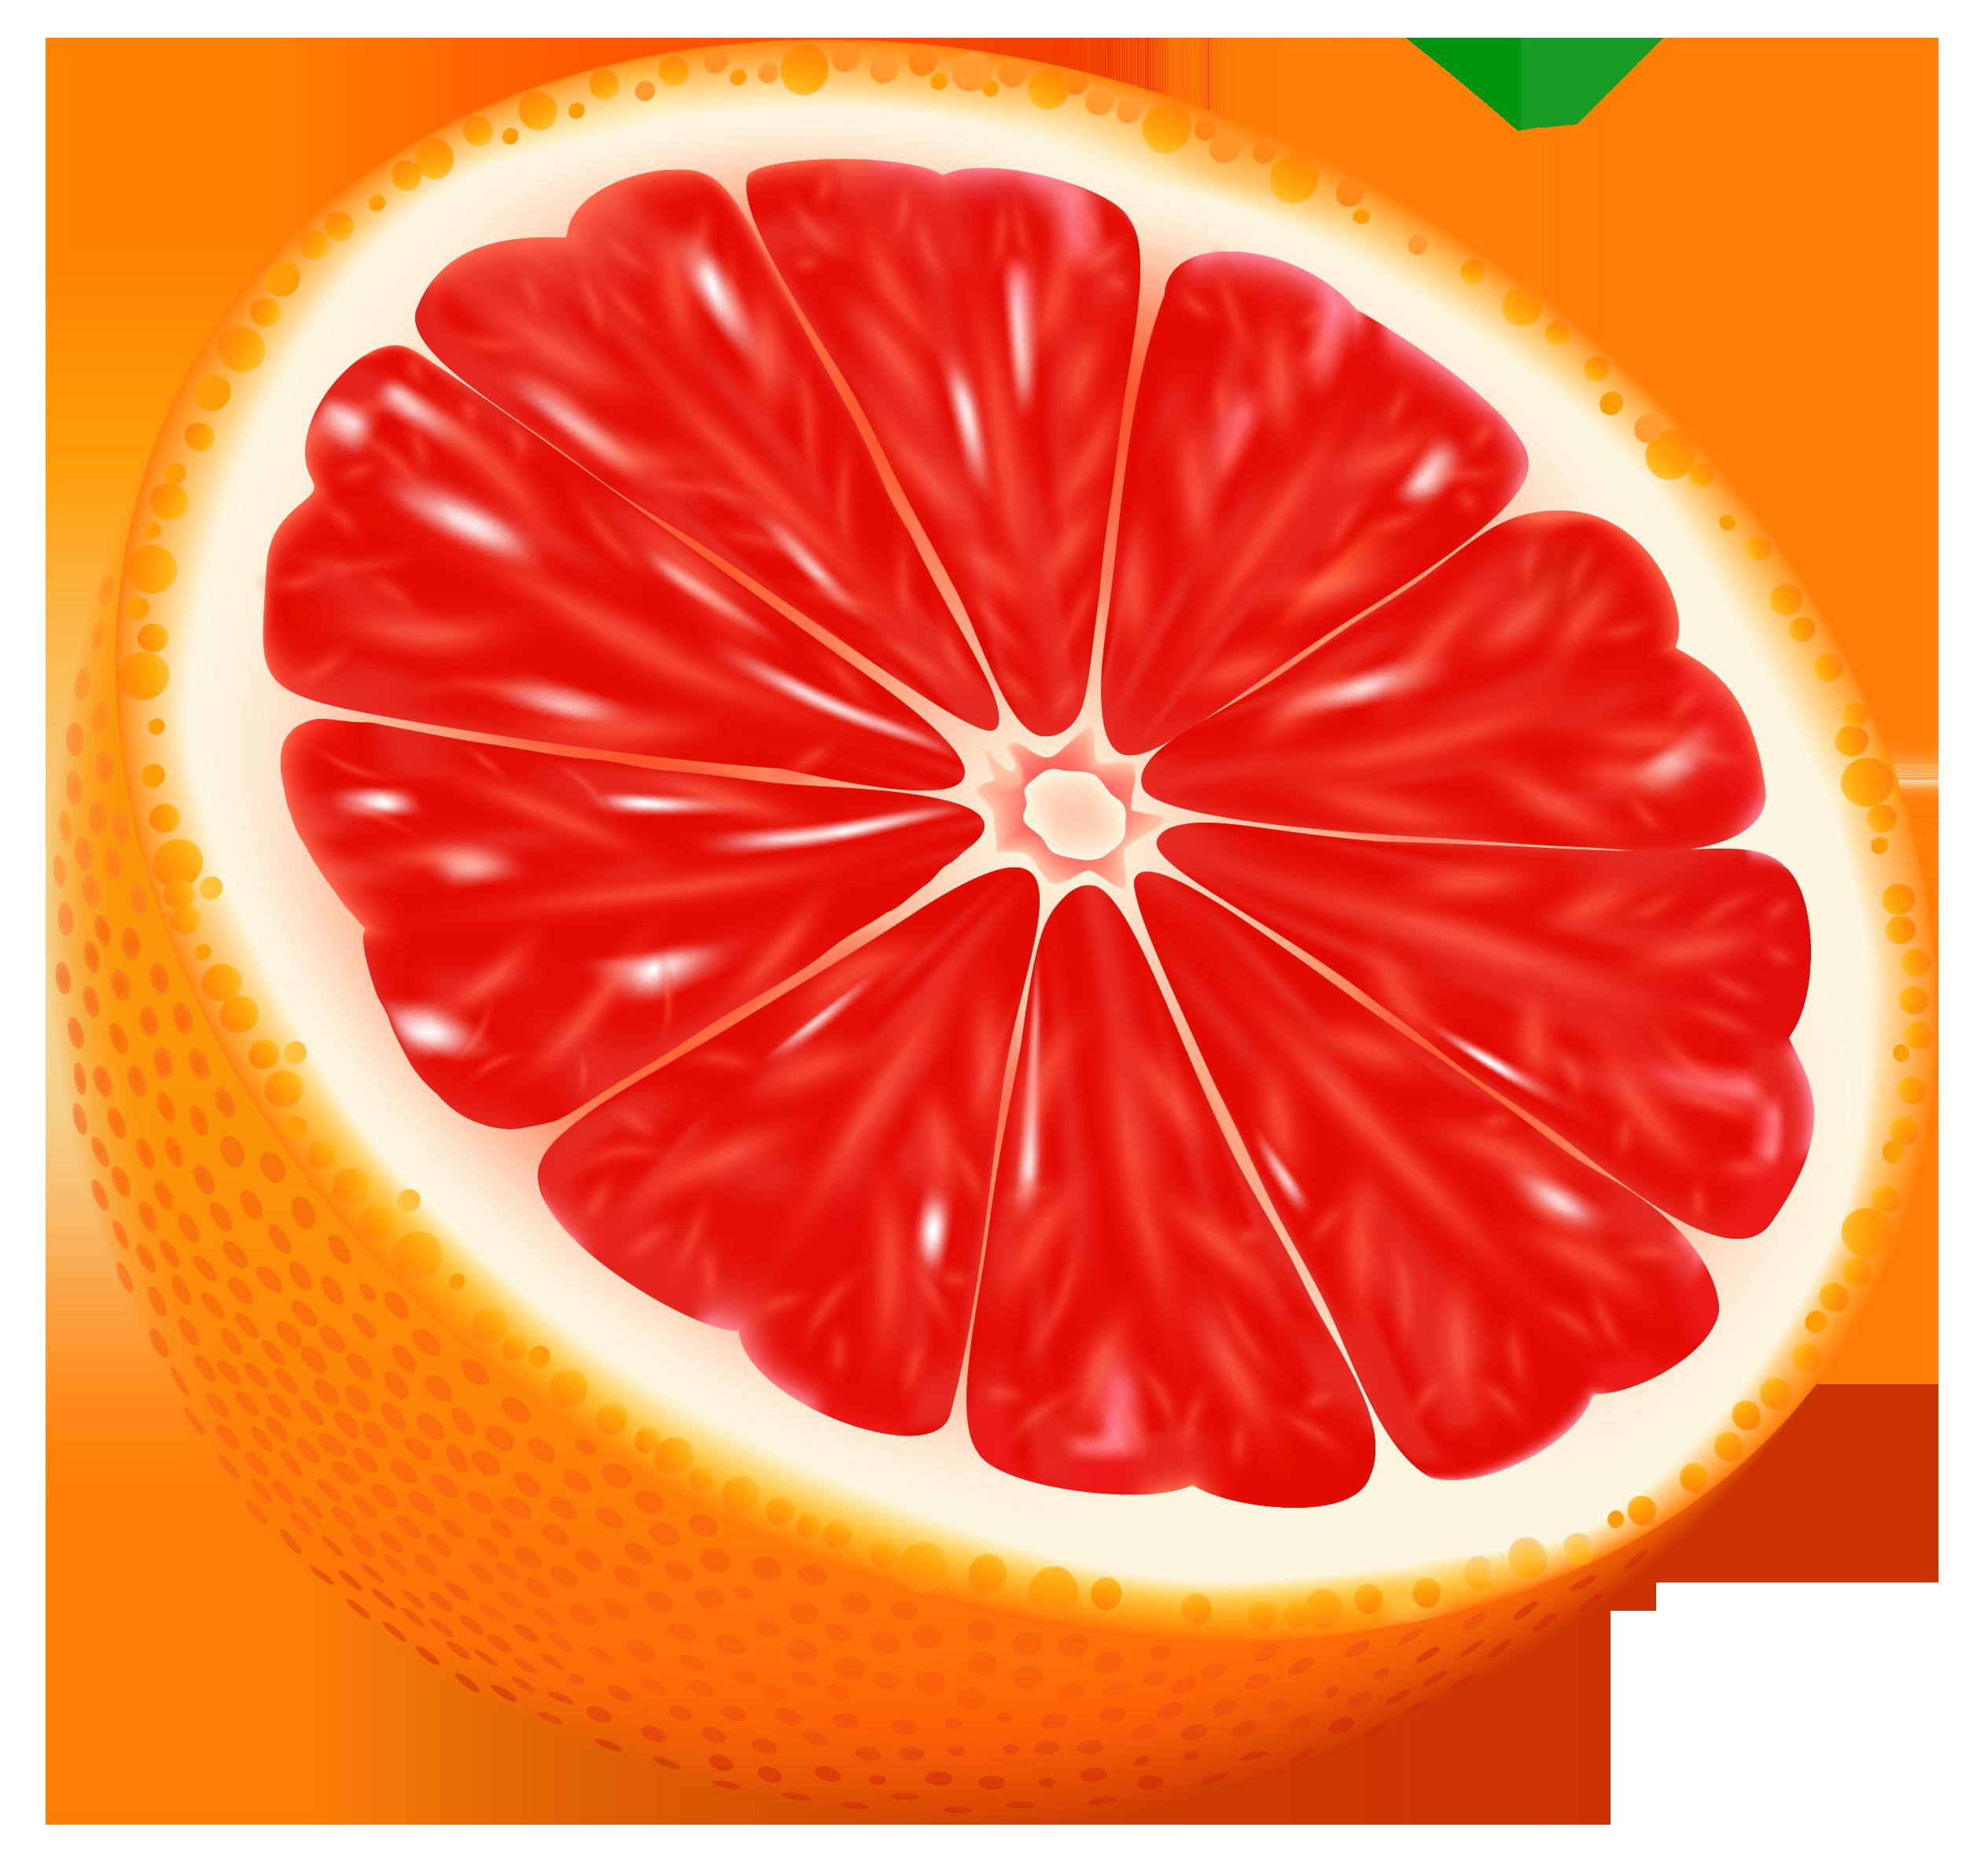 Jokingart com half red. Kite clipart orange